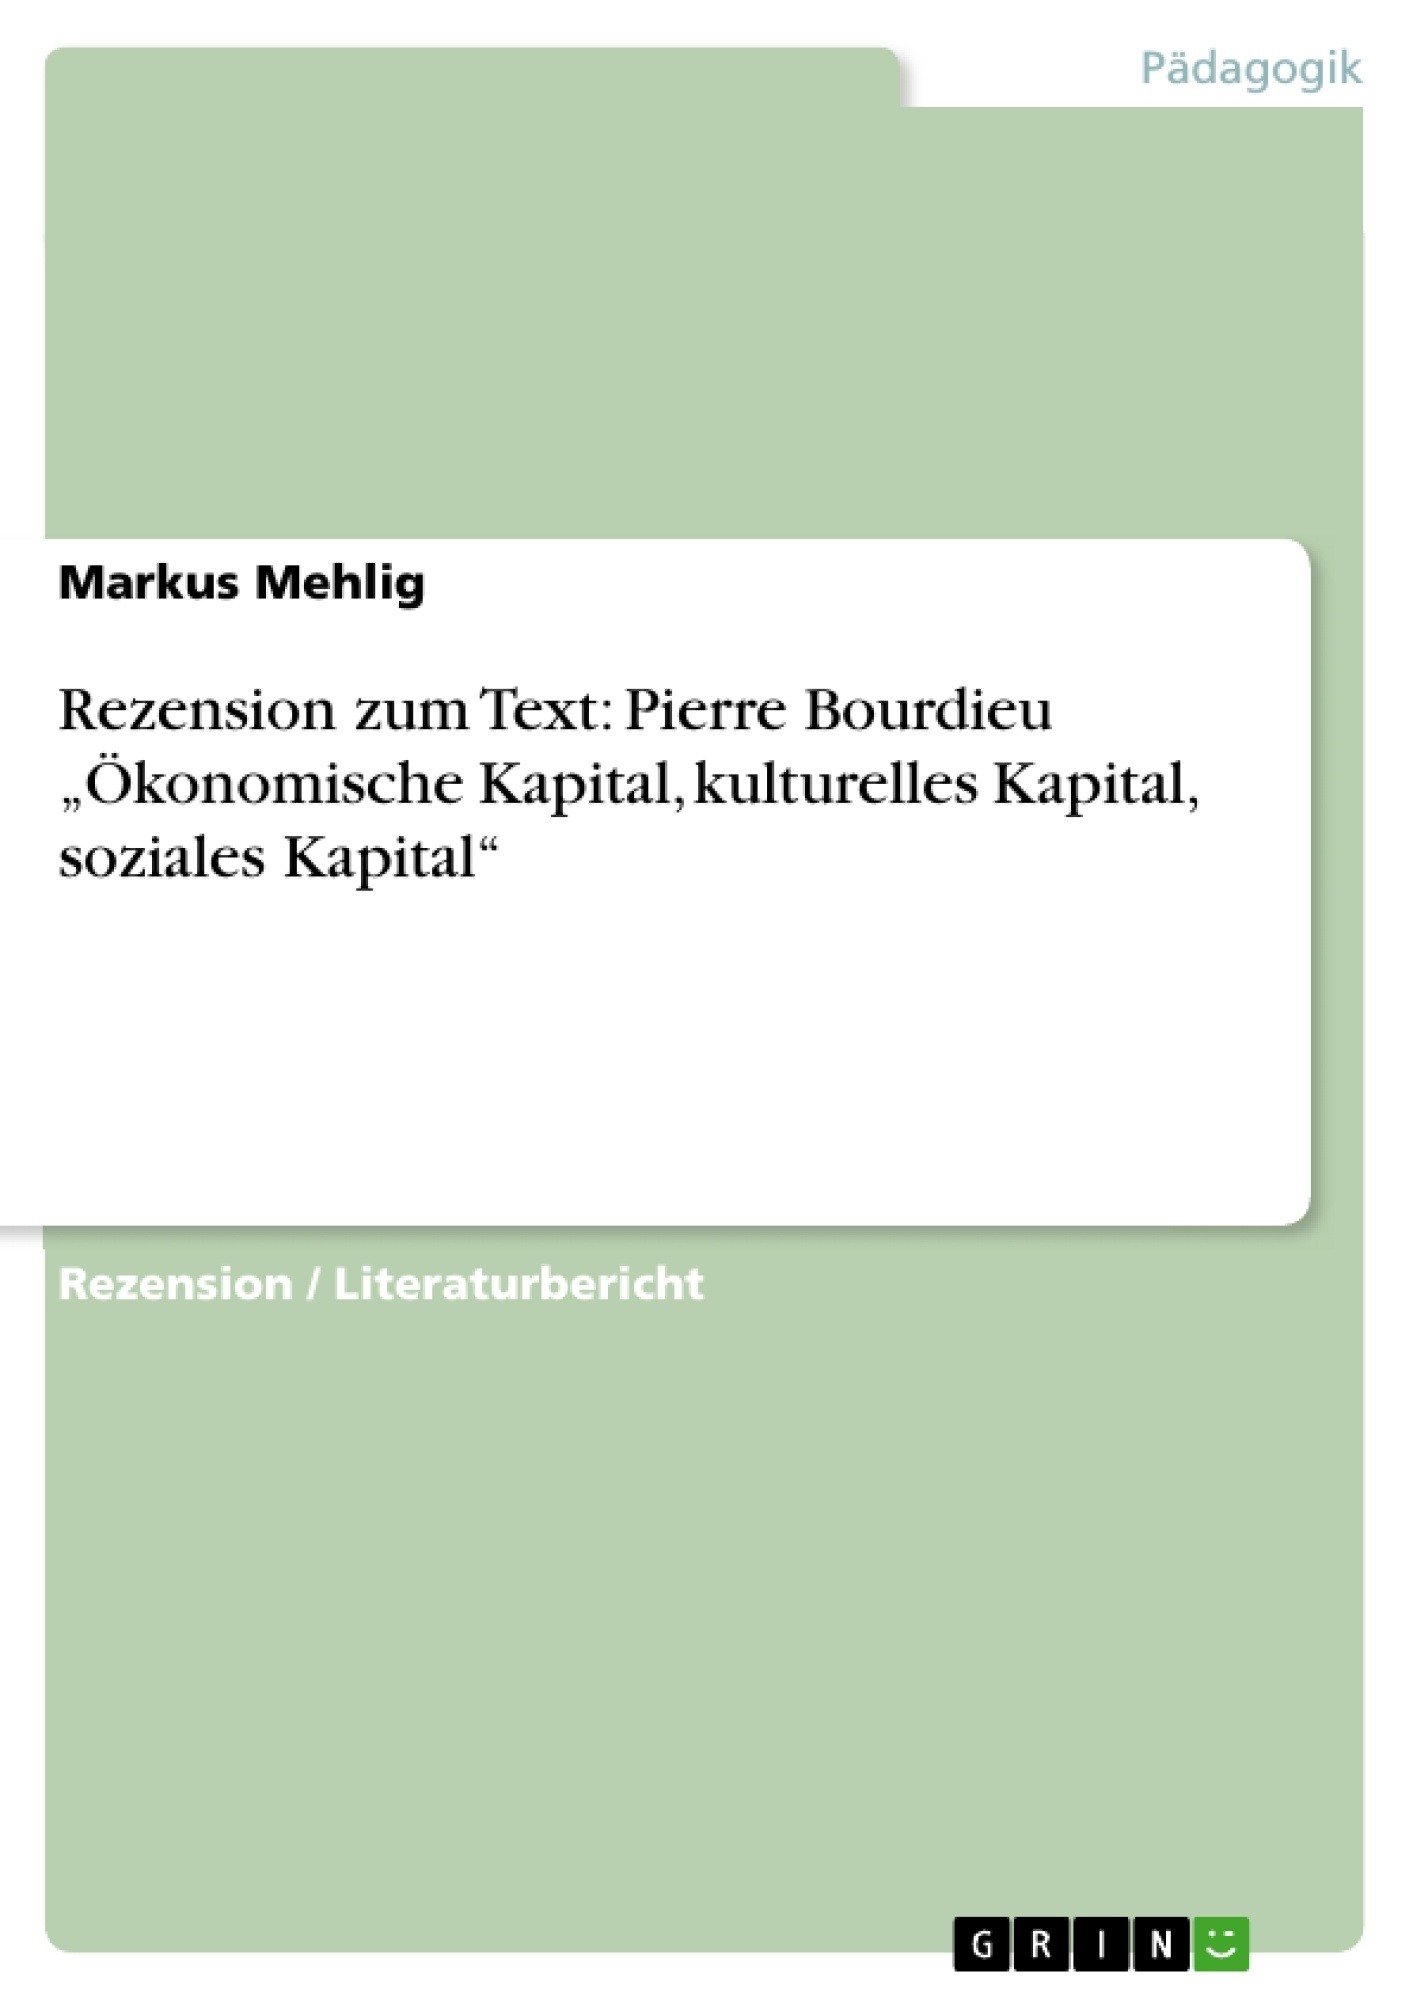 "Titel: Rezension zum Text: Pierre Bourdieu ""Ökonomische Kapital, kulturelles Kapital, soziales Kapital"""